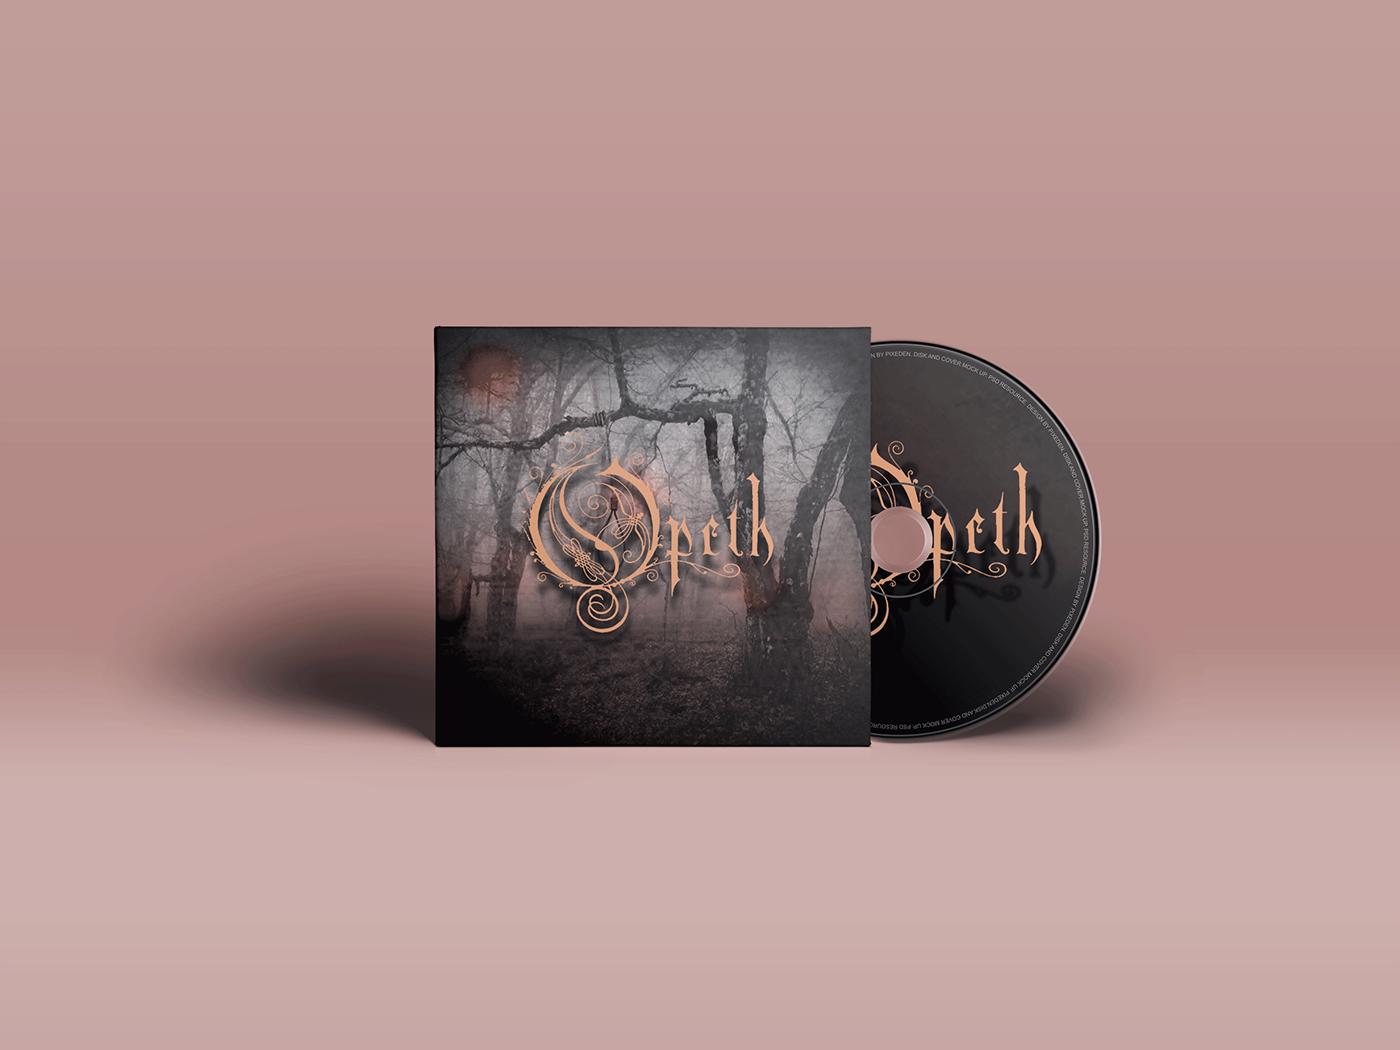 Opeth music artwork branding vector logo creative manipulation album artwork photoshop illustration photoshop art design